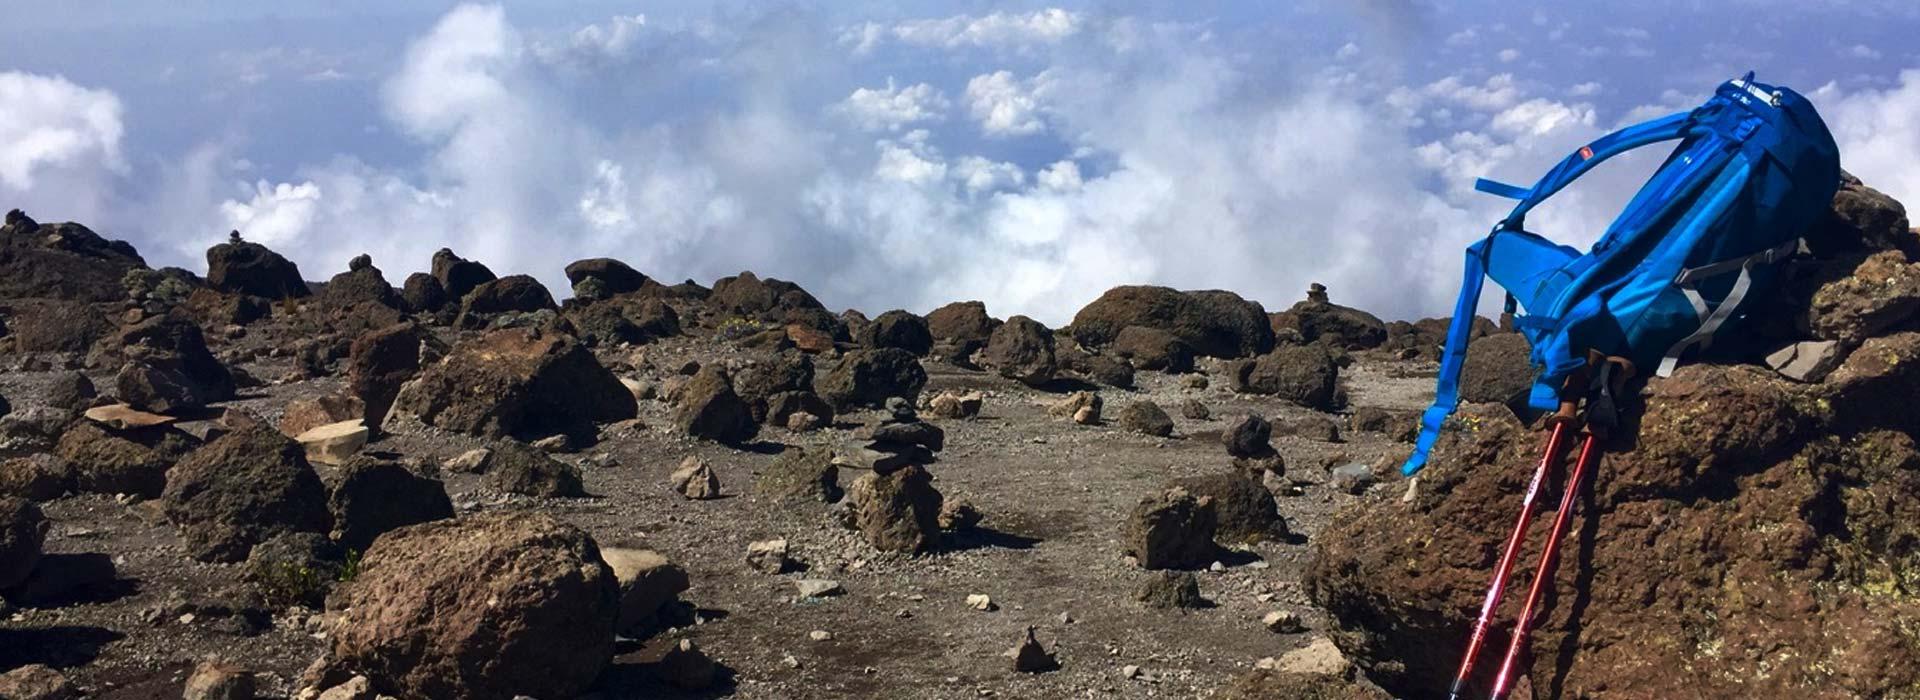 Kilimanjaro Altitude Sickness